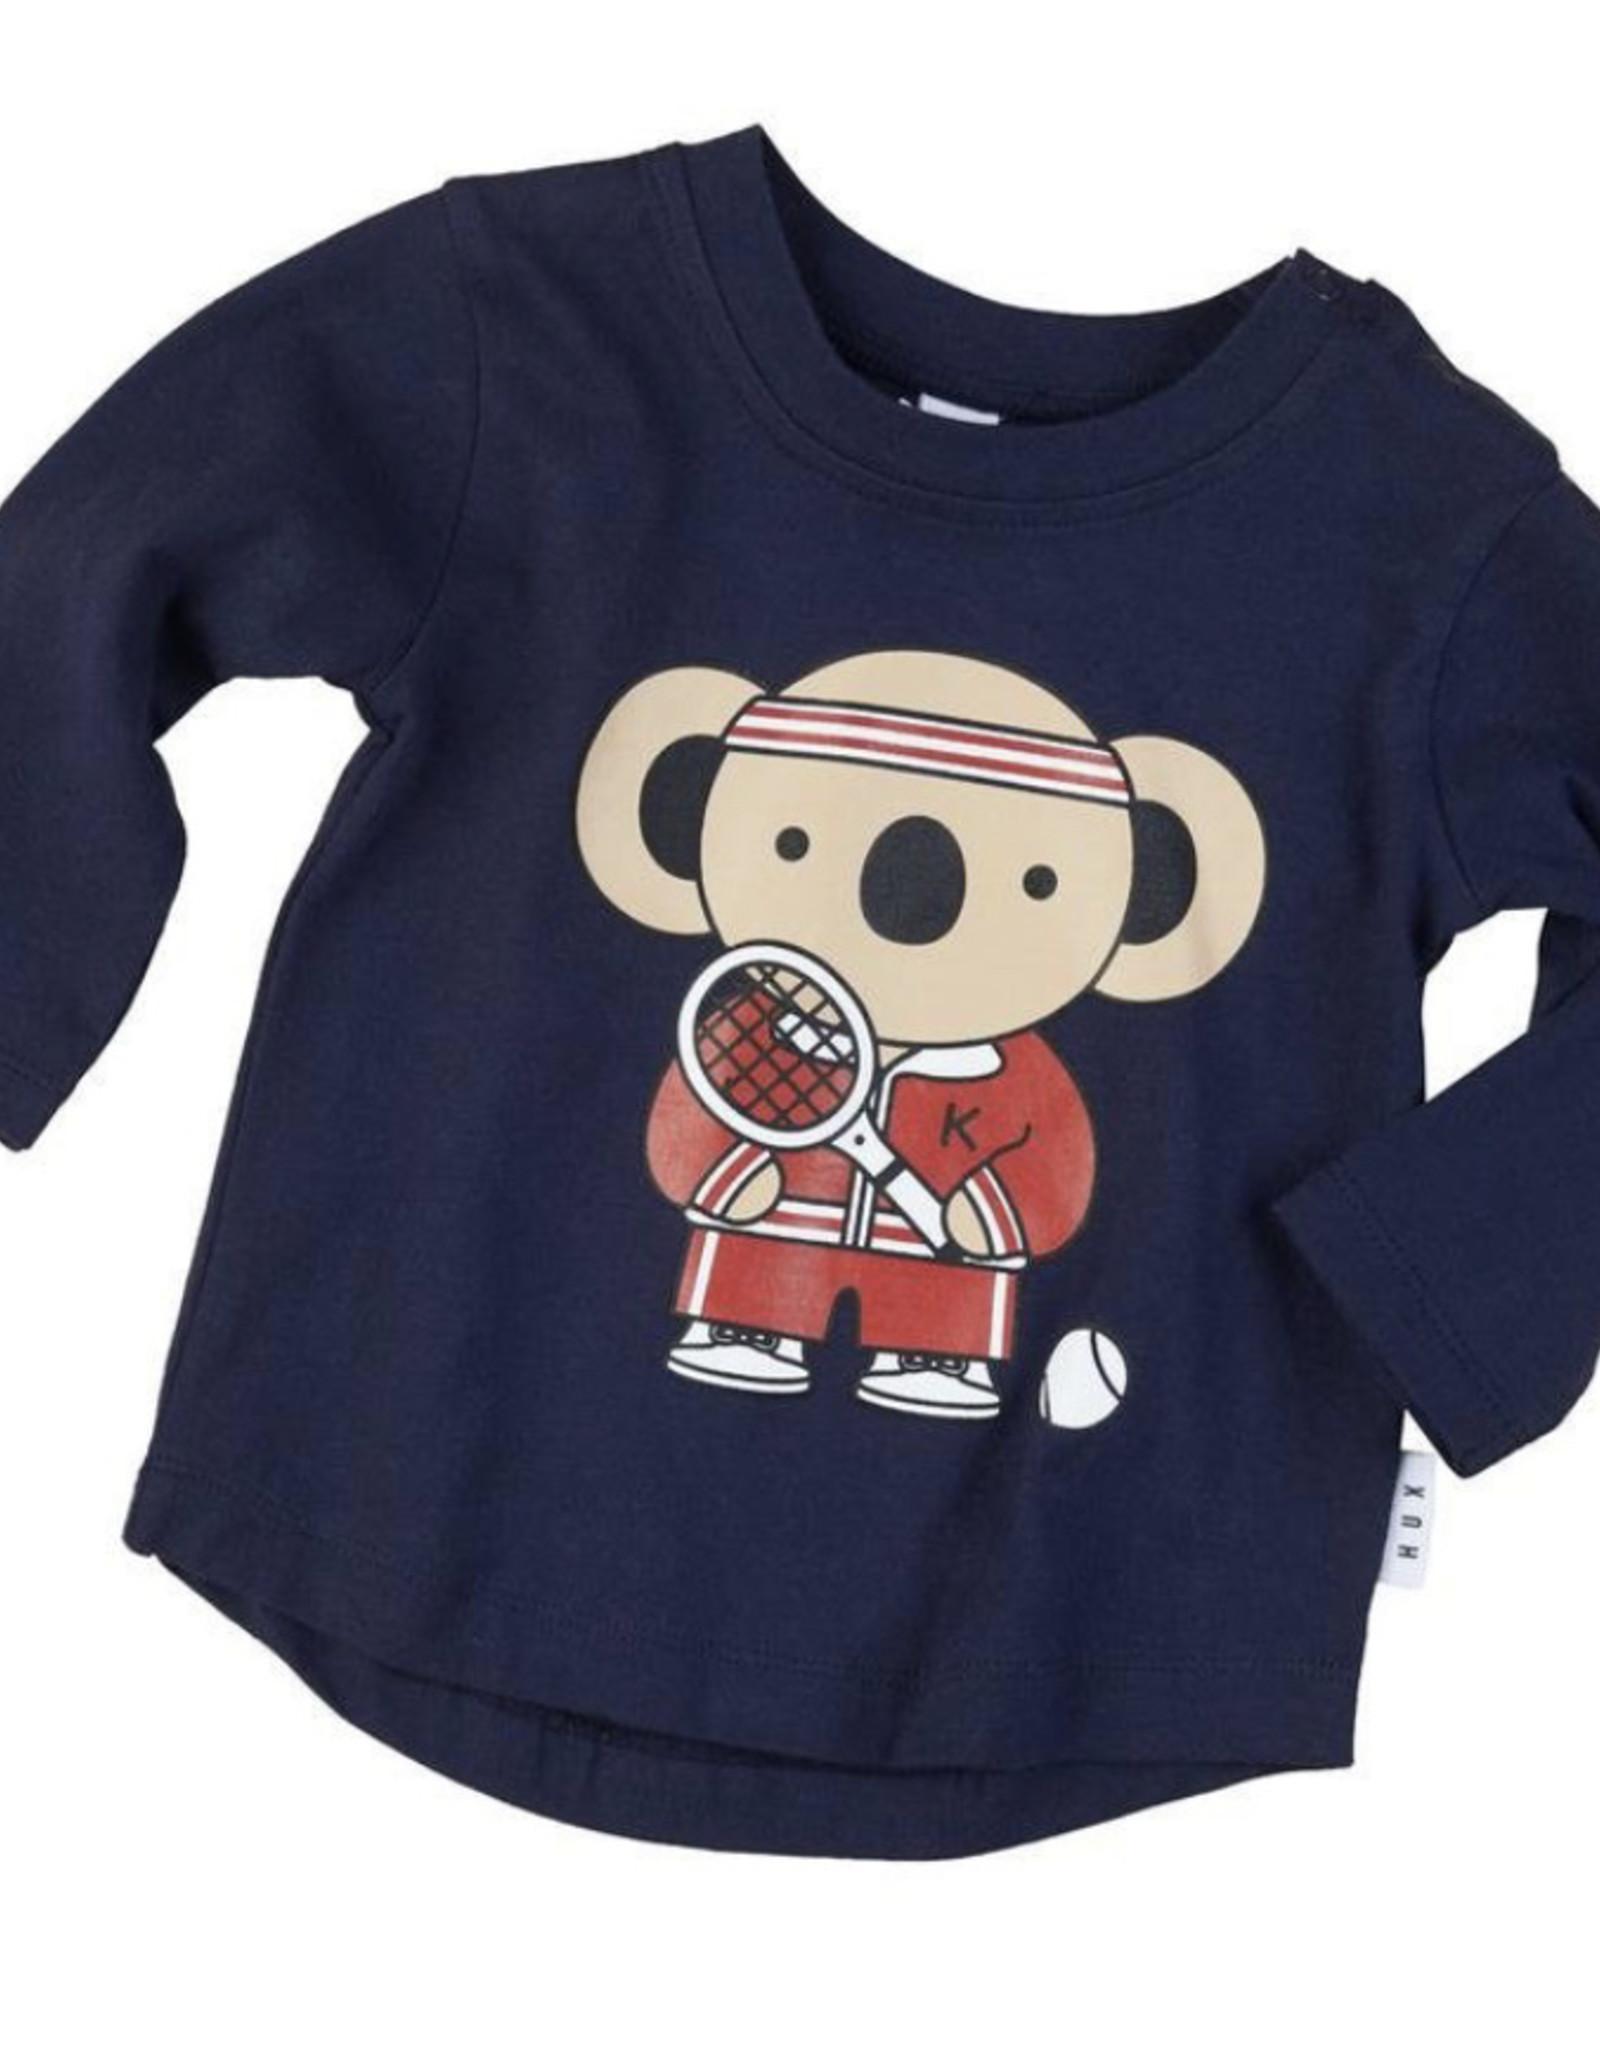 HuxBaby - Tennis Koala Top